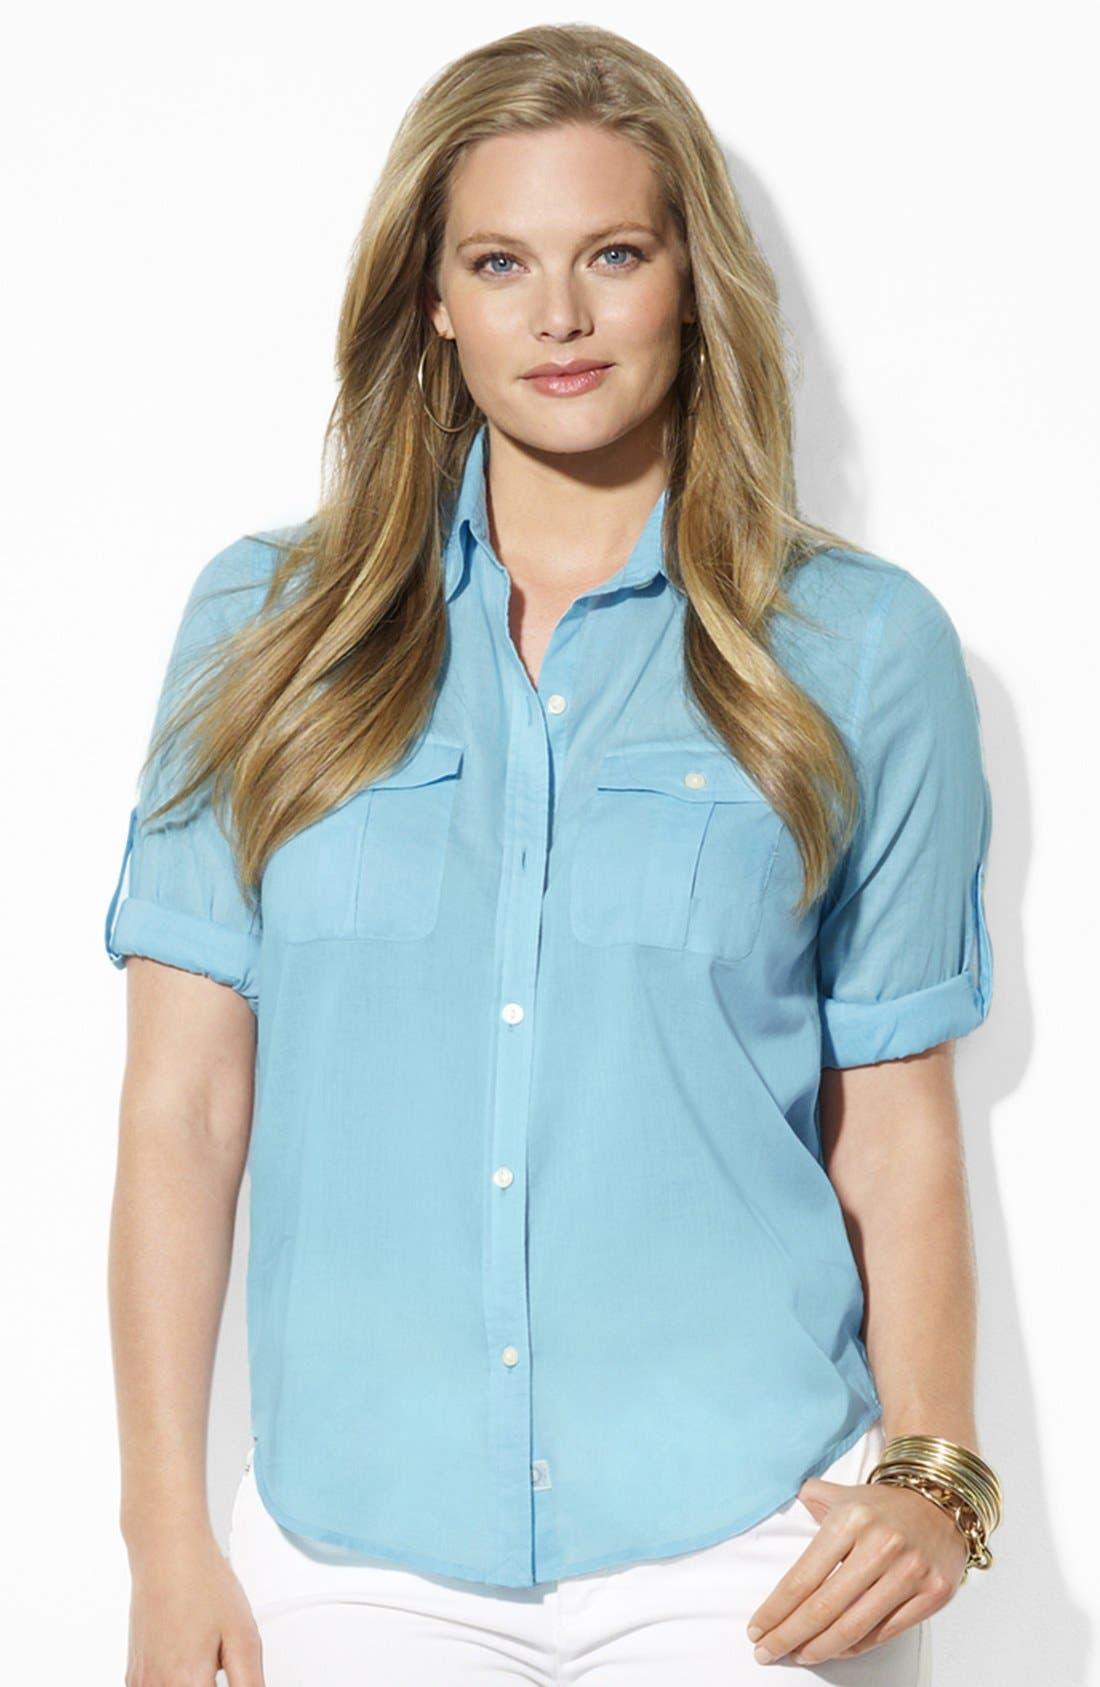 Alternate Image 1 Selected - Lauren Ralph Lauren Cotton Work Shirt (Plus Size)